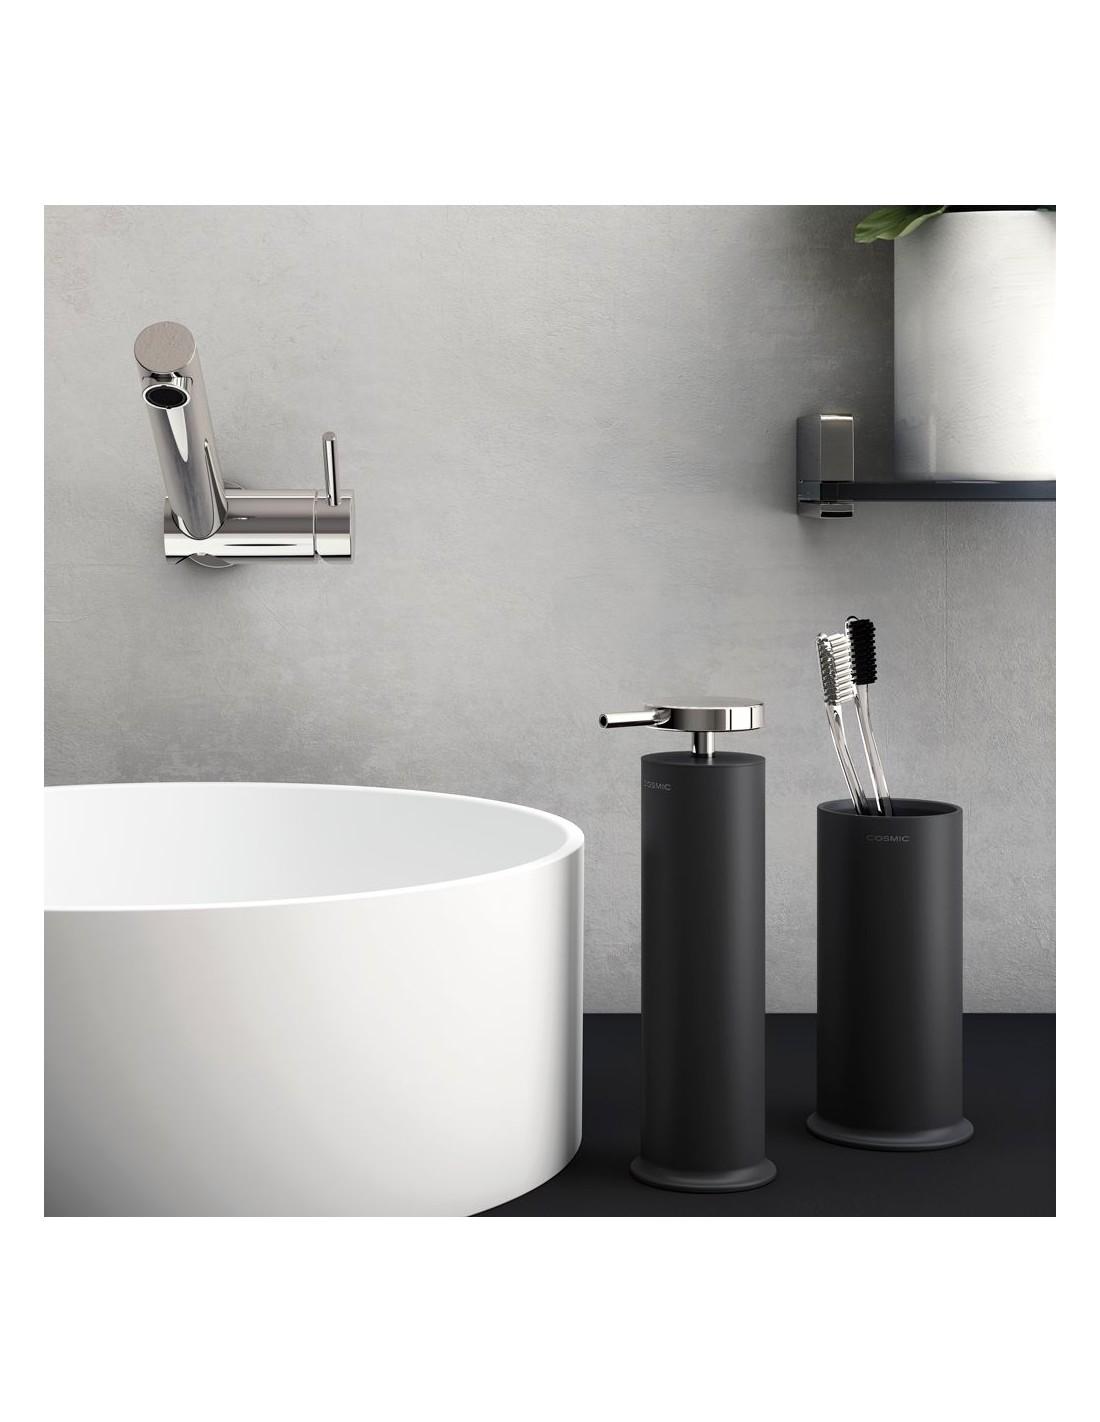 mise en scène distributeur noir de savon liquide GEYSER de COSMIC